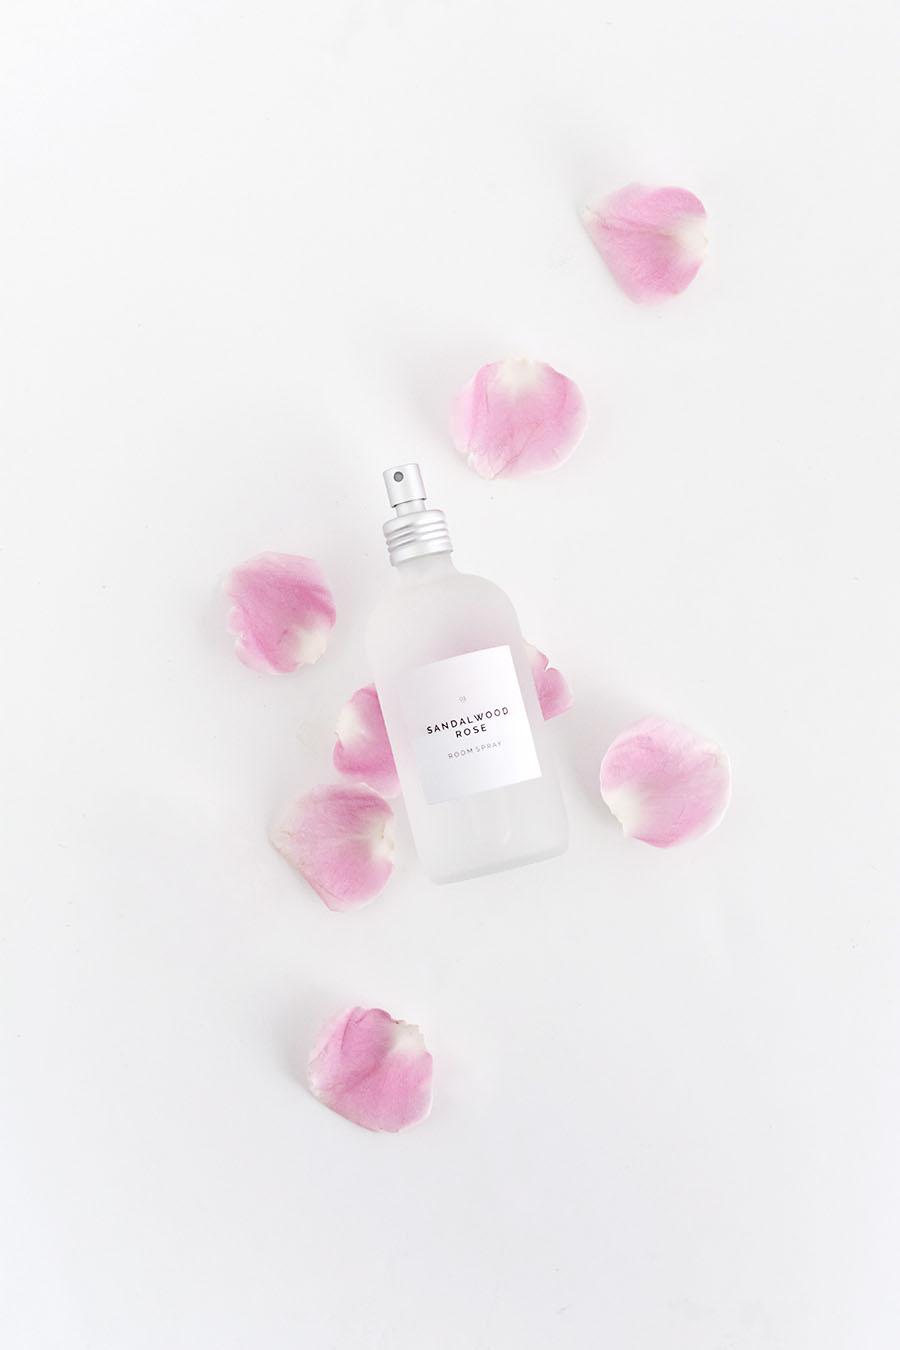 diy-sandalwood-rose-room-spray-with-printable-label-